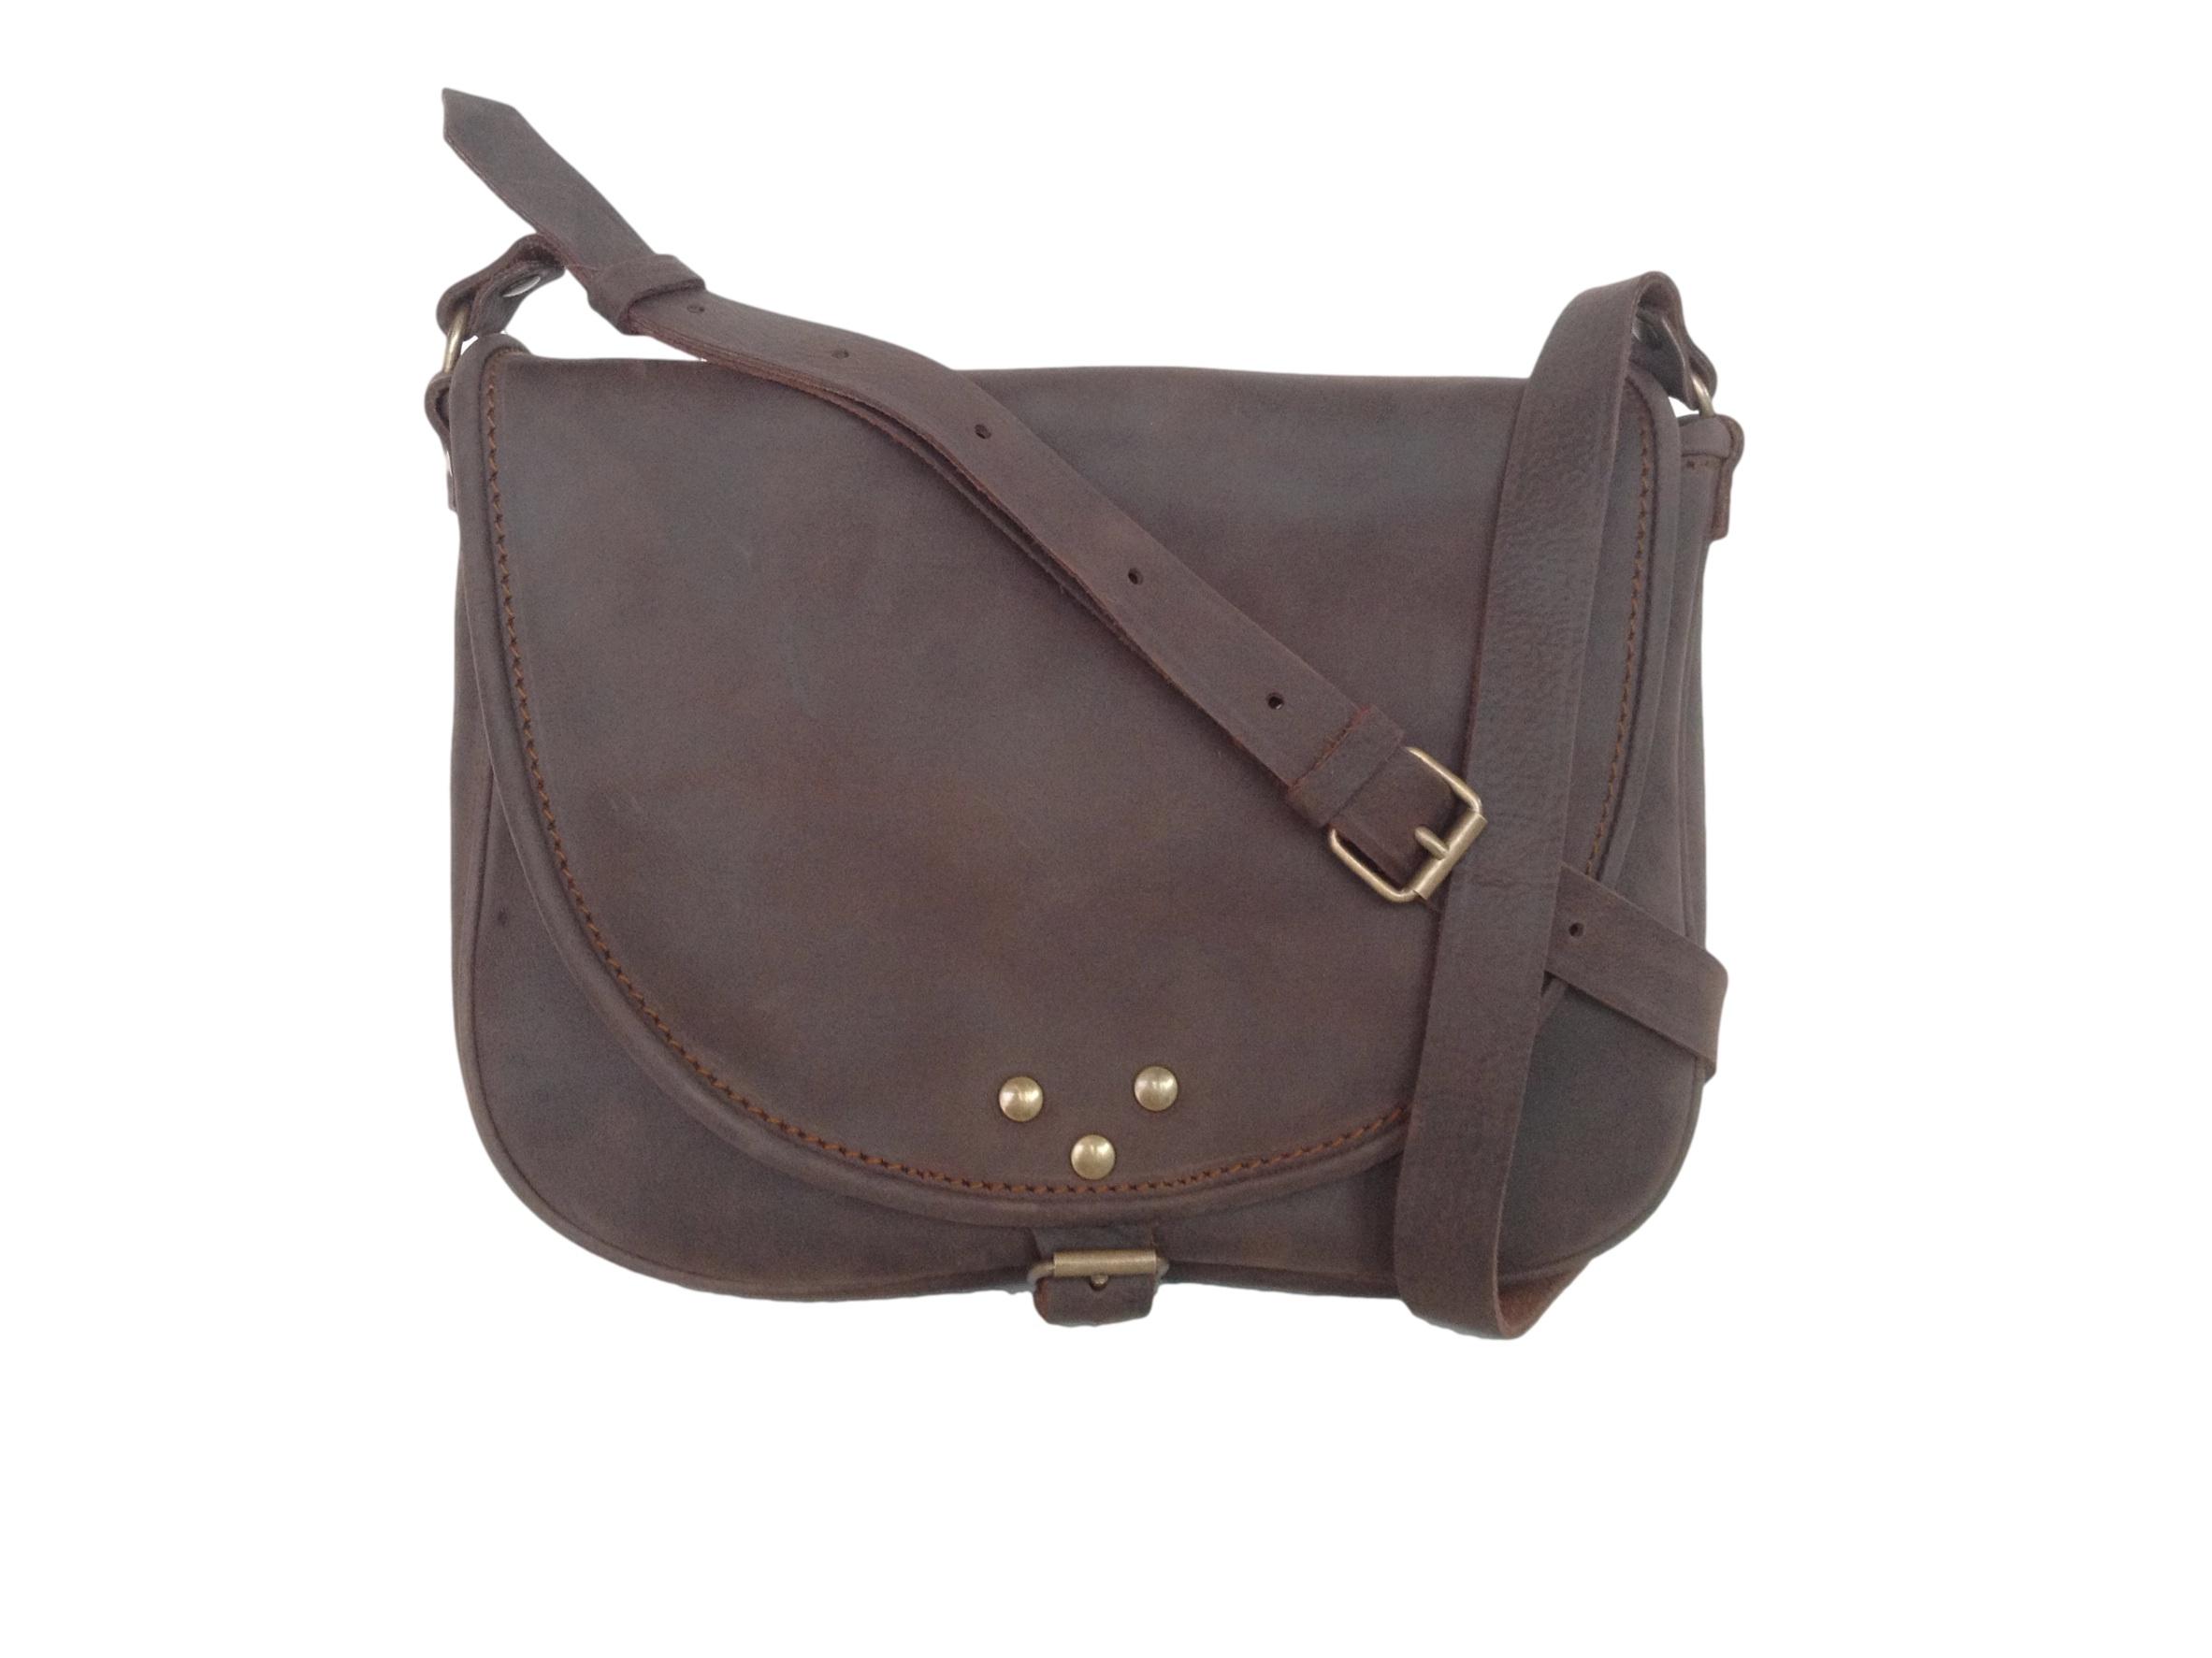 Borse Pelle Vintage : Tolfa citt? di famosa per la borsa in pelle catana